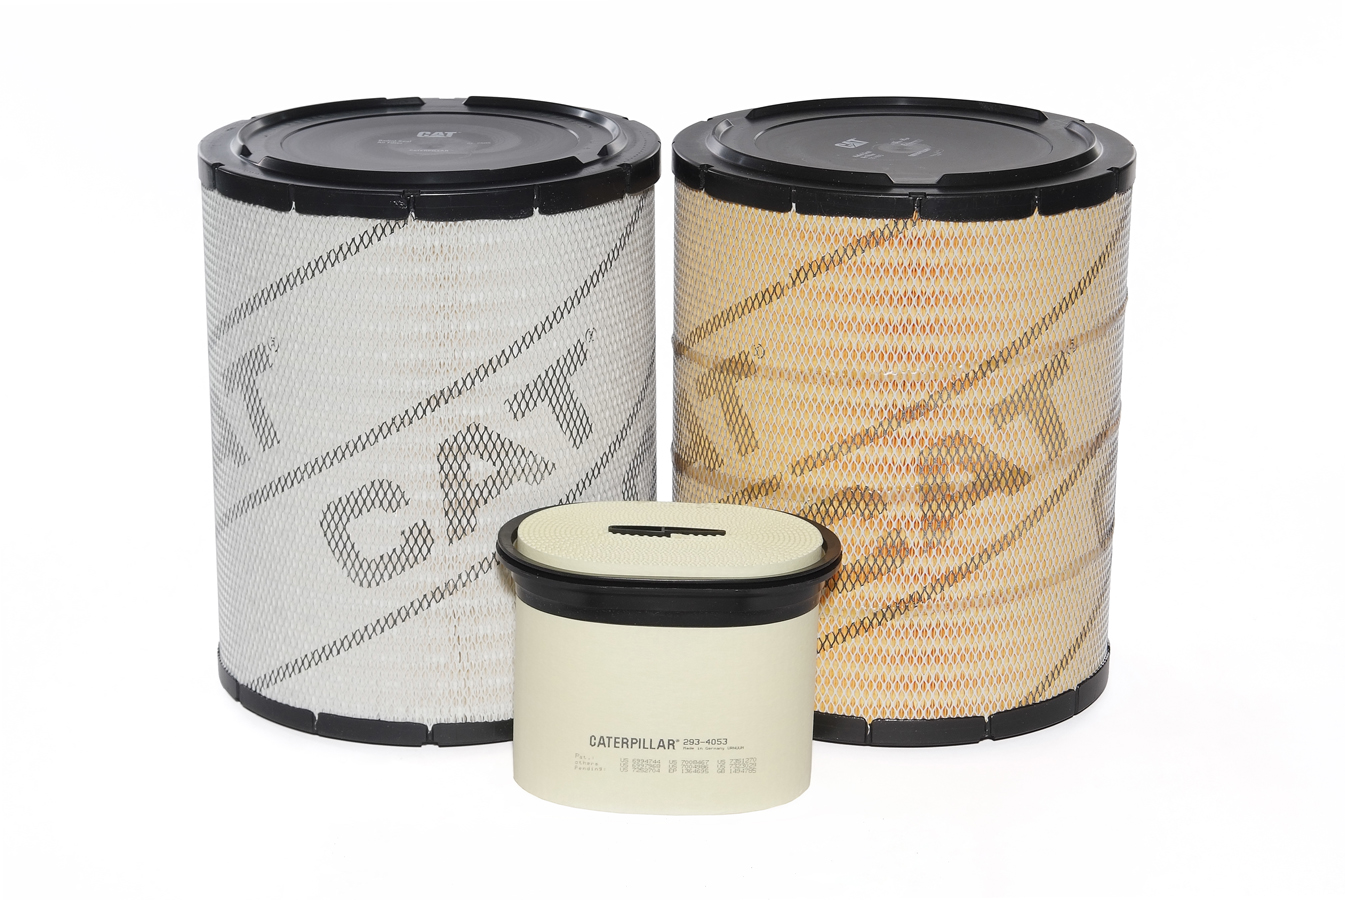 Caterpillar Air Filters